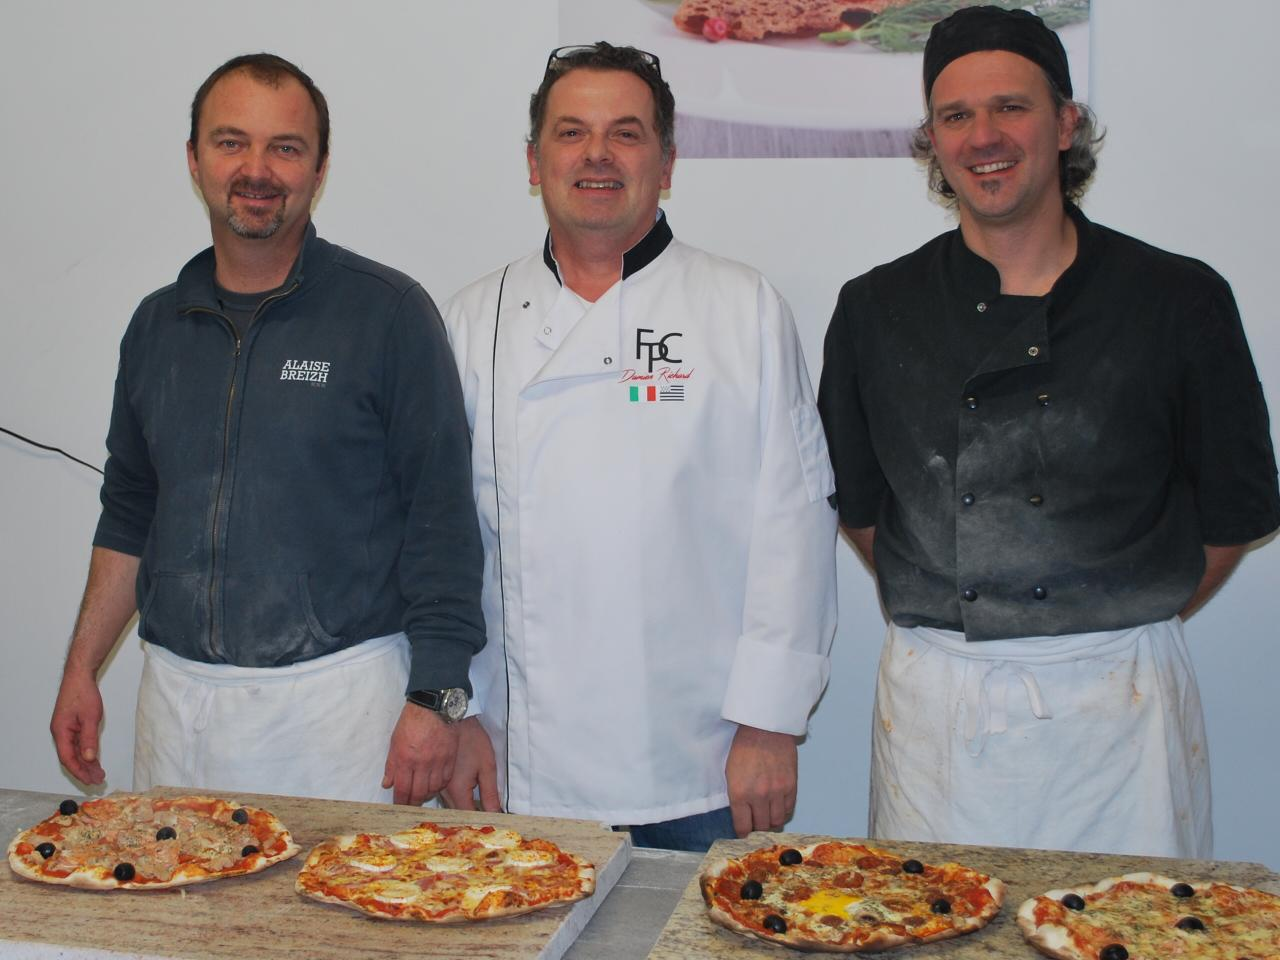 Formation Pizzaiolo Crêpier Miniac Morvan FPC 35 (51)